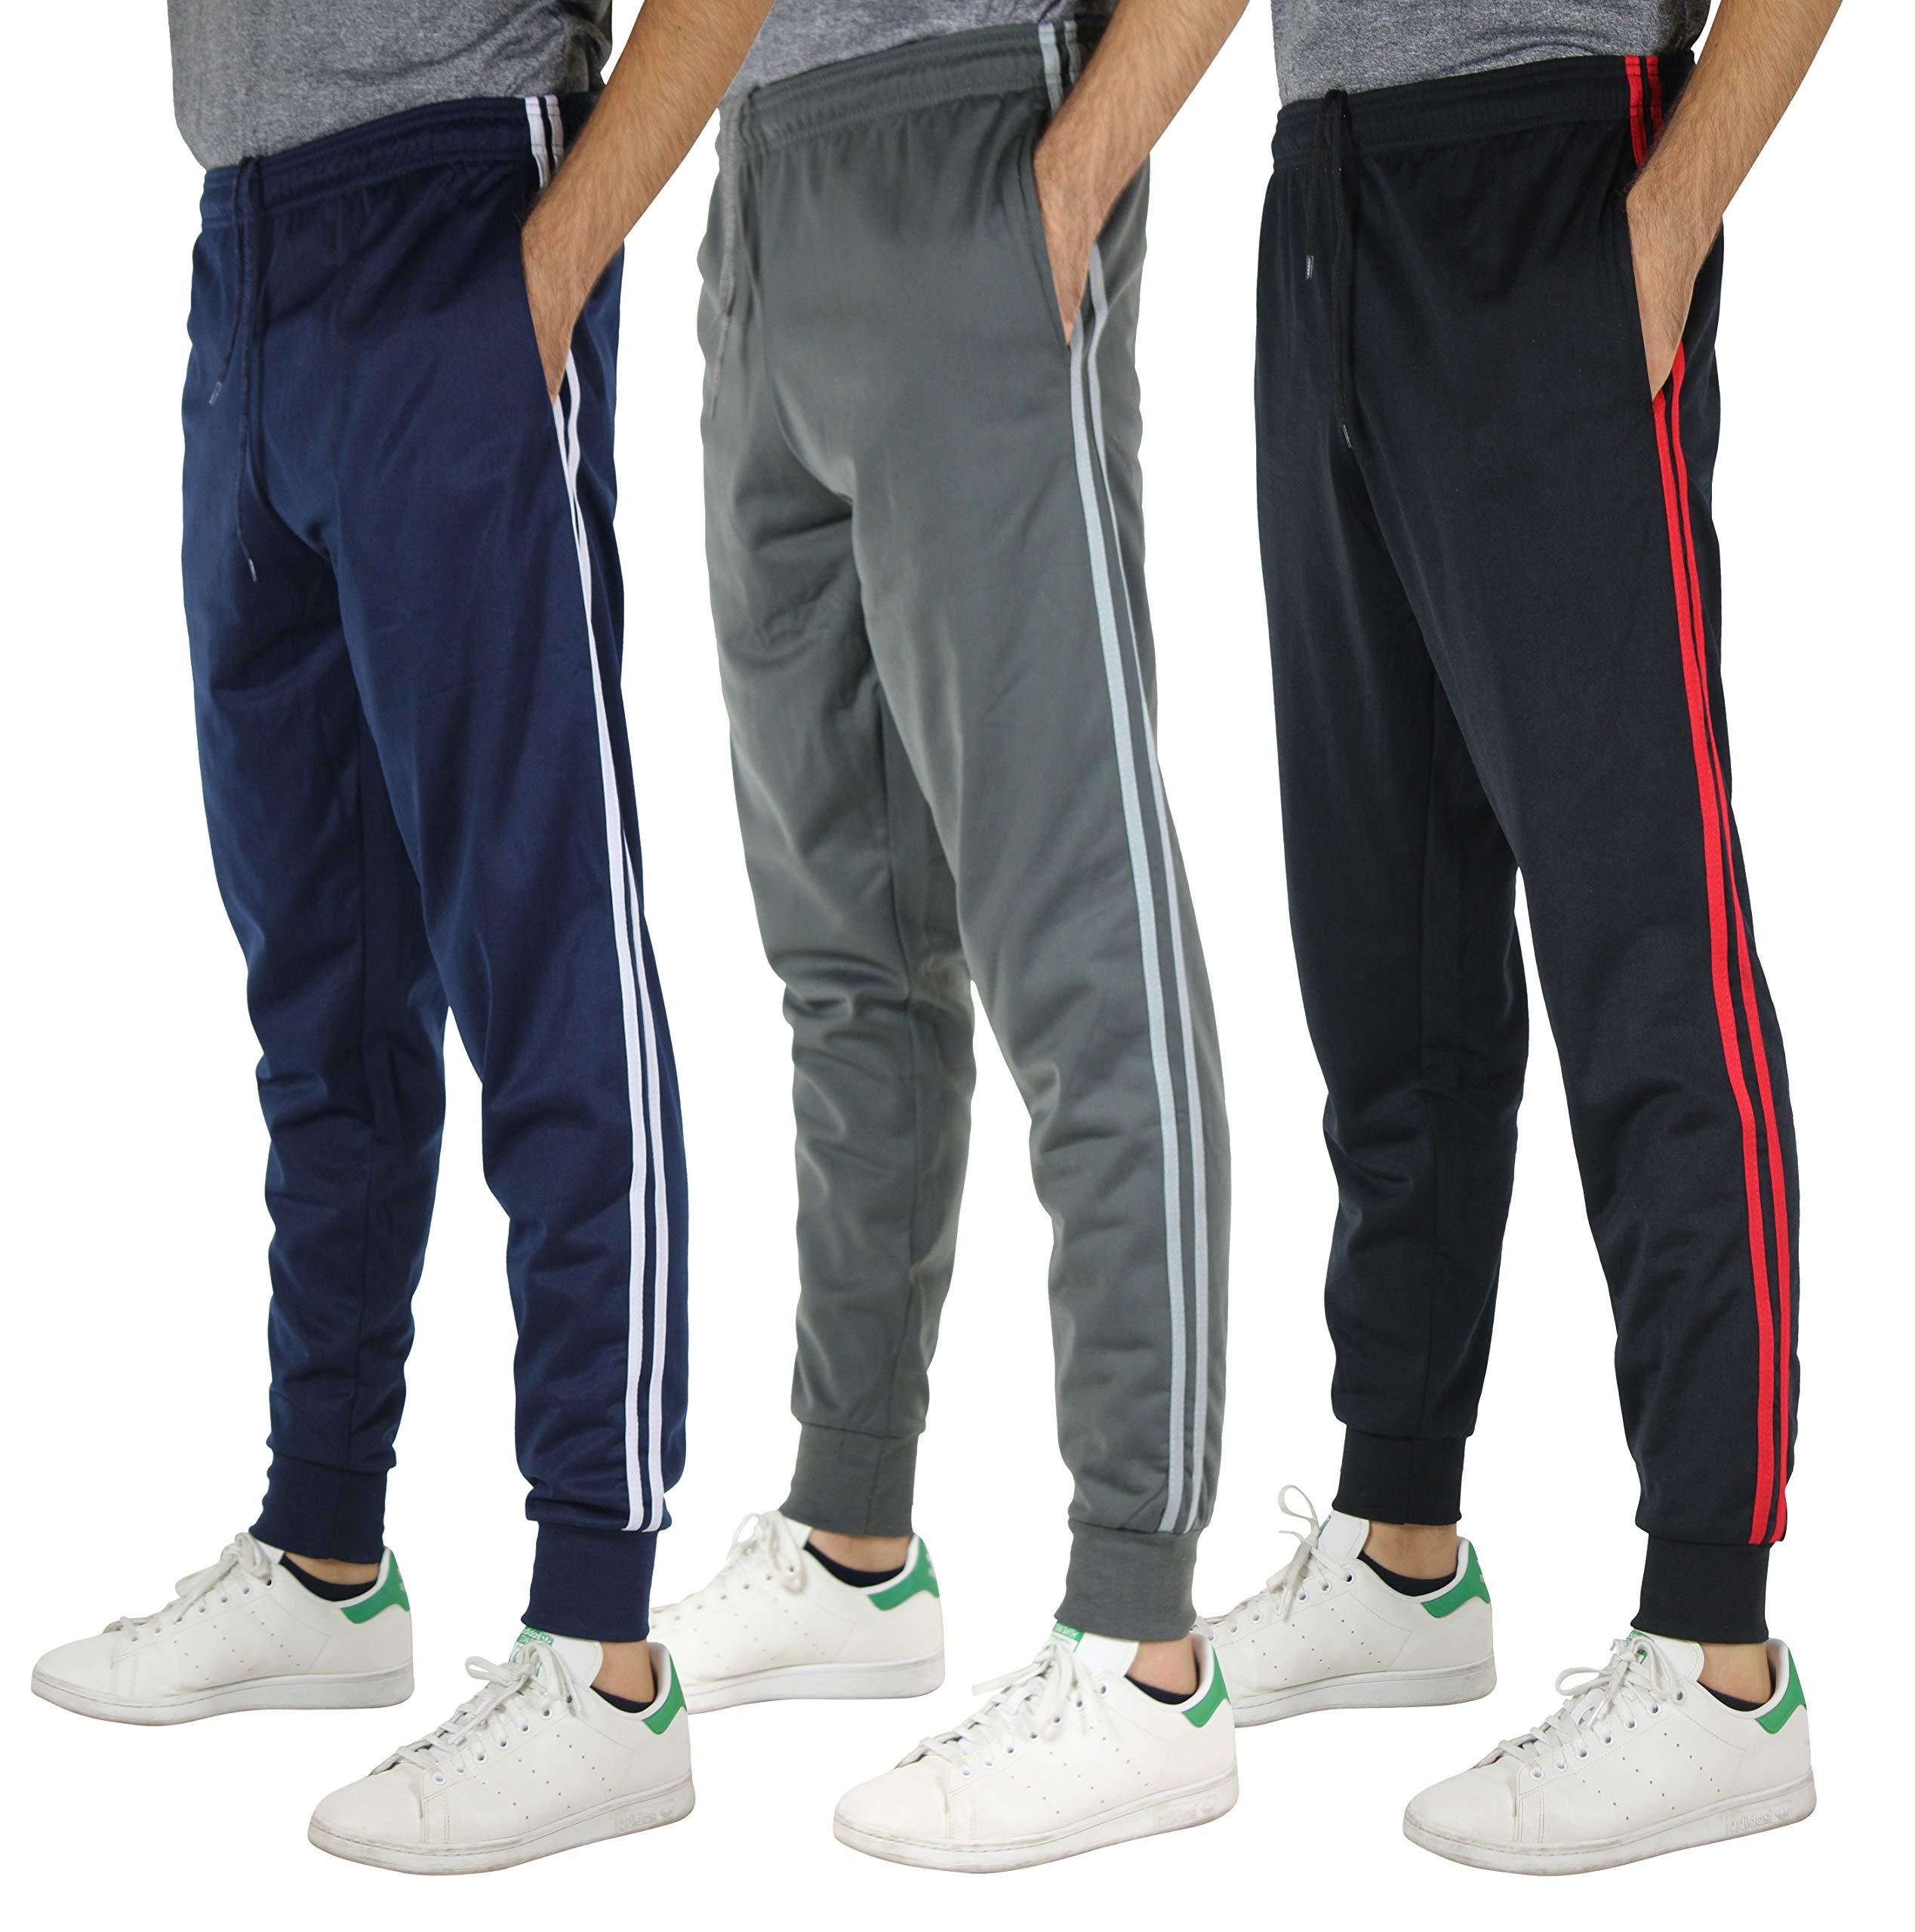 20d94661351e2 Real Essentials 3 Pack Men s Tricot Casual Active Track Soccer Jogger  Sweatpants Fleece Slim Fit